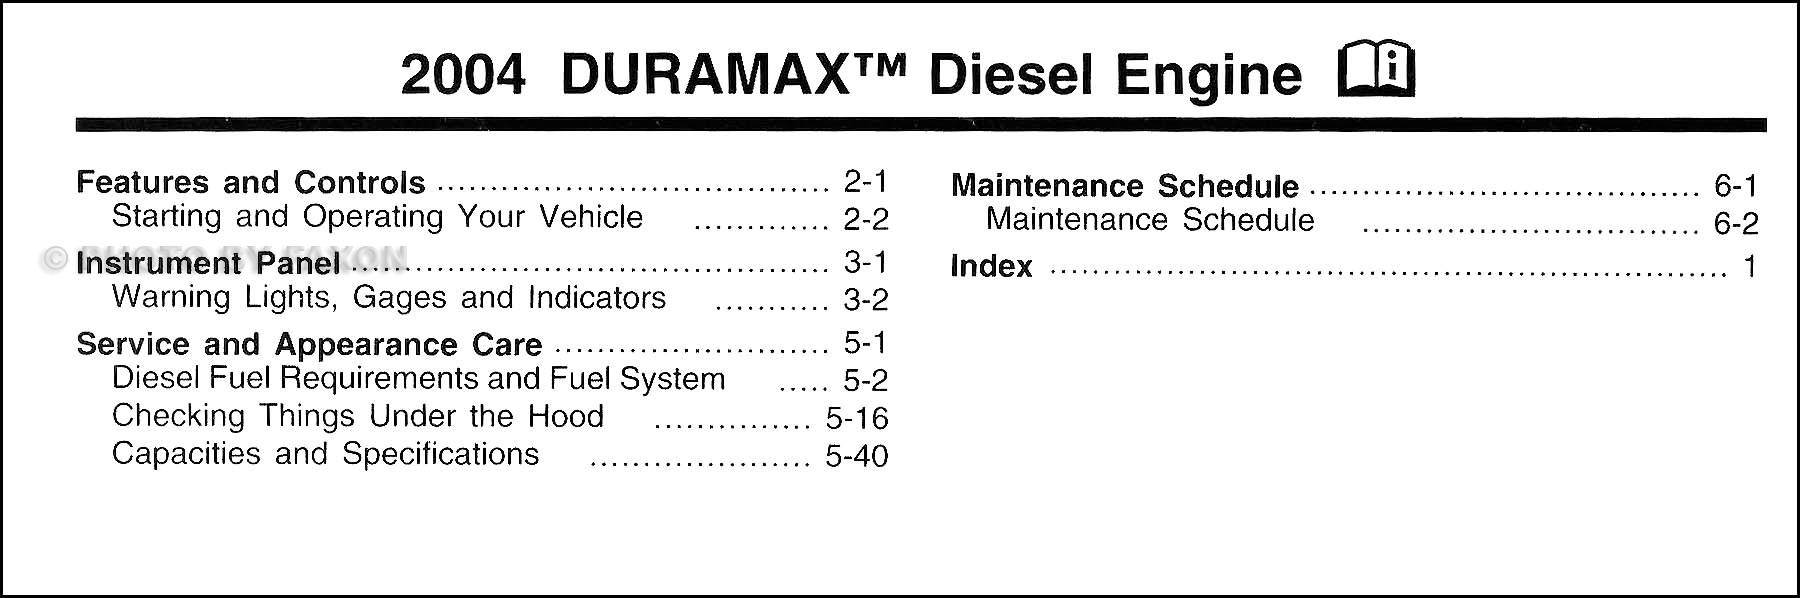 Chevy 1500 maintenance schedules user manuals array 2004 silverado sierra duramax diesel owners manual supp chevrolet gmc rh faxonautoliterature com fandeluxe Image collections